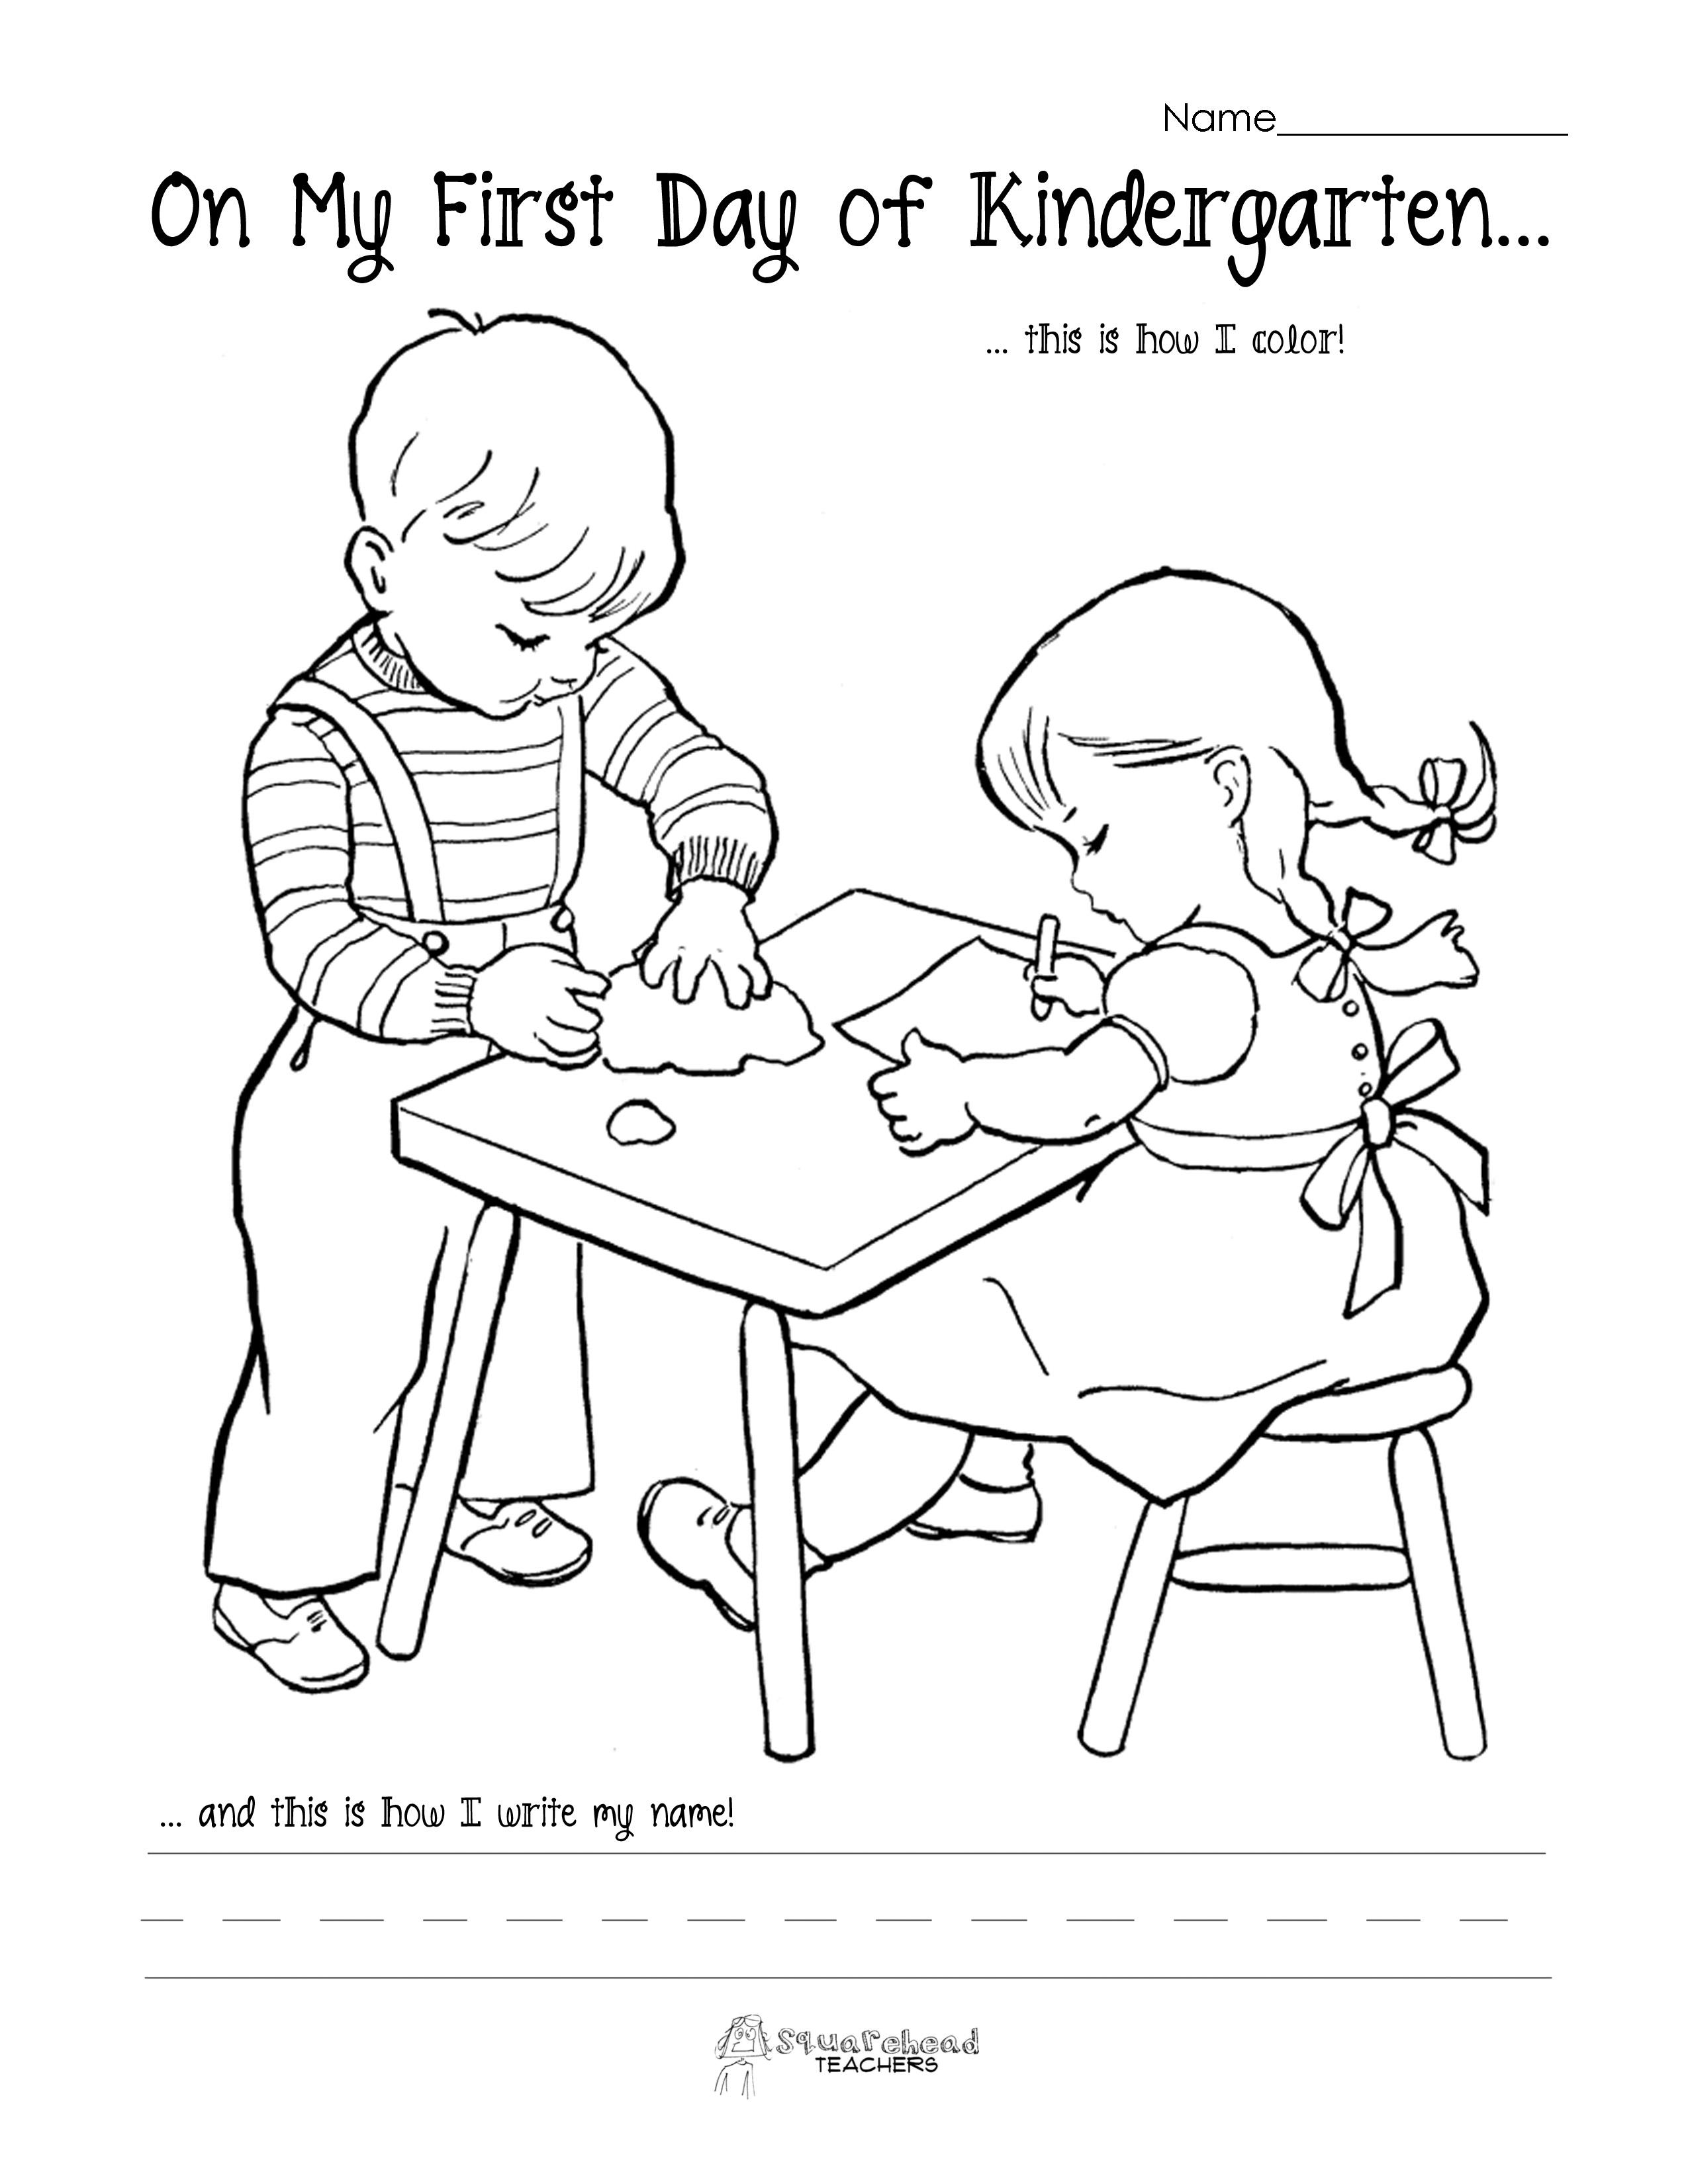 18 Best Images Of Fun Behavior Worksheets Printable